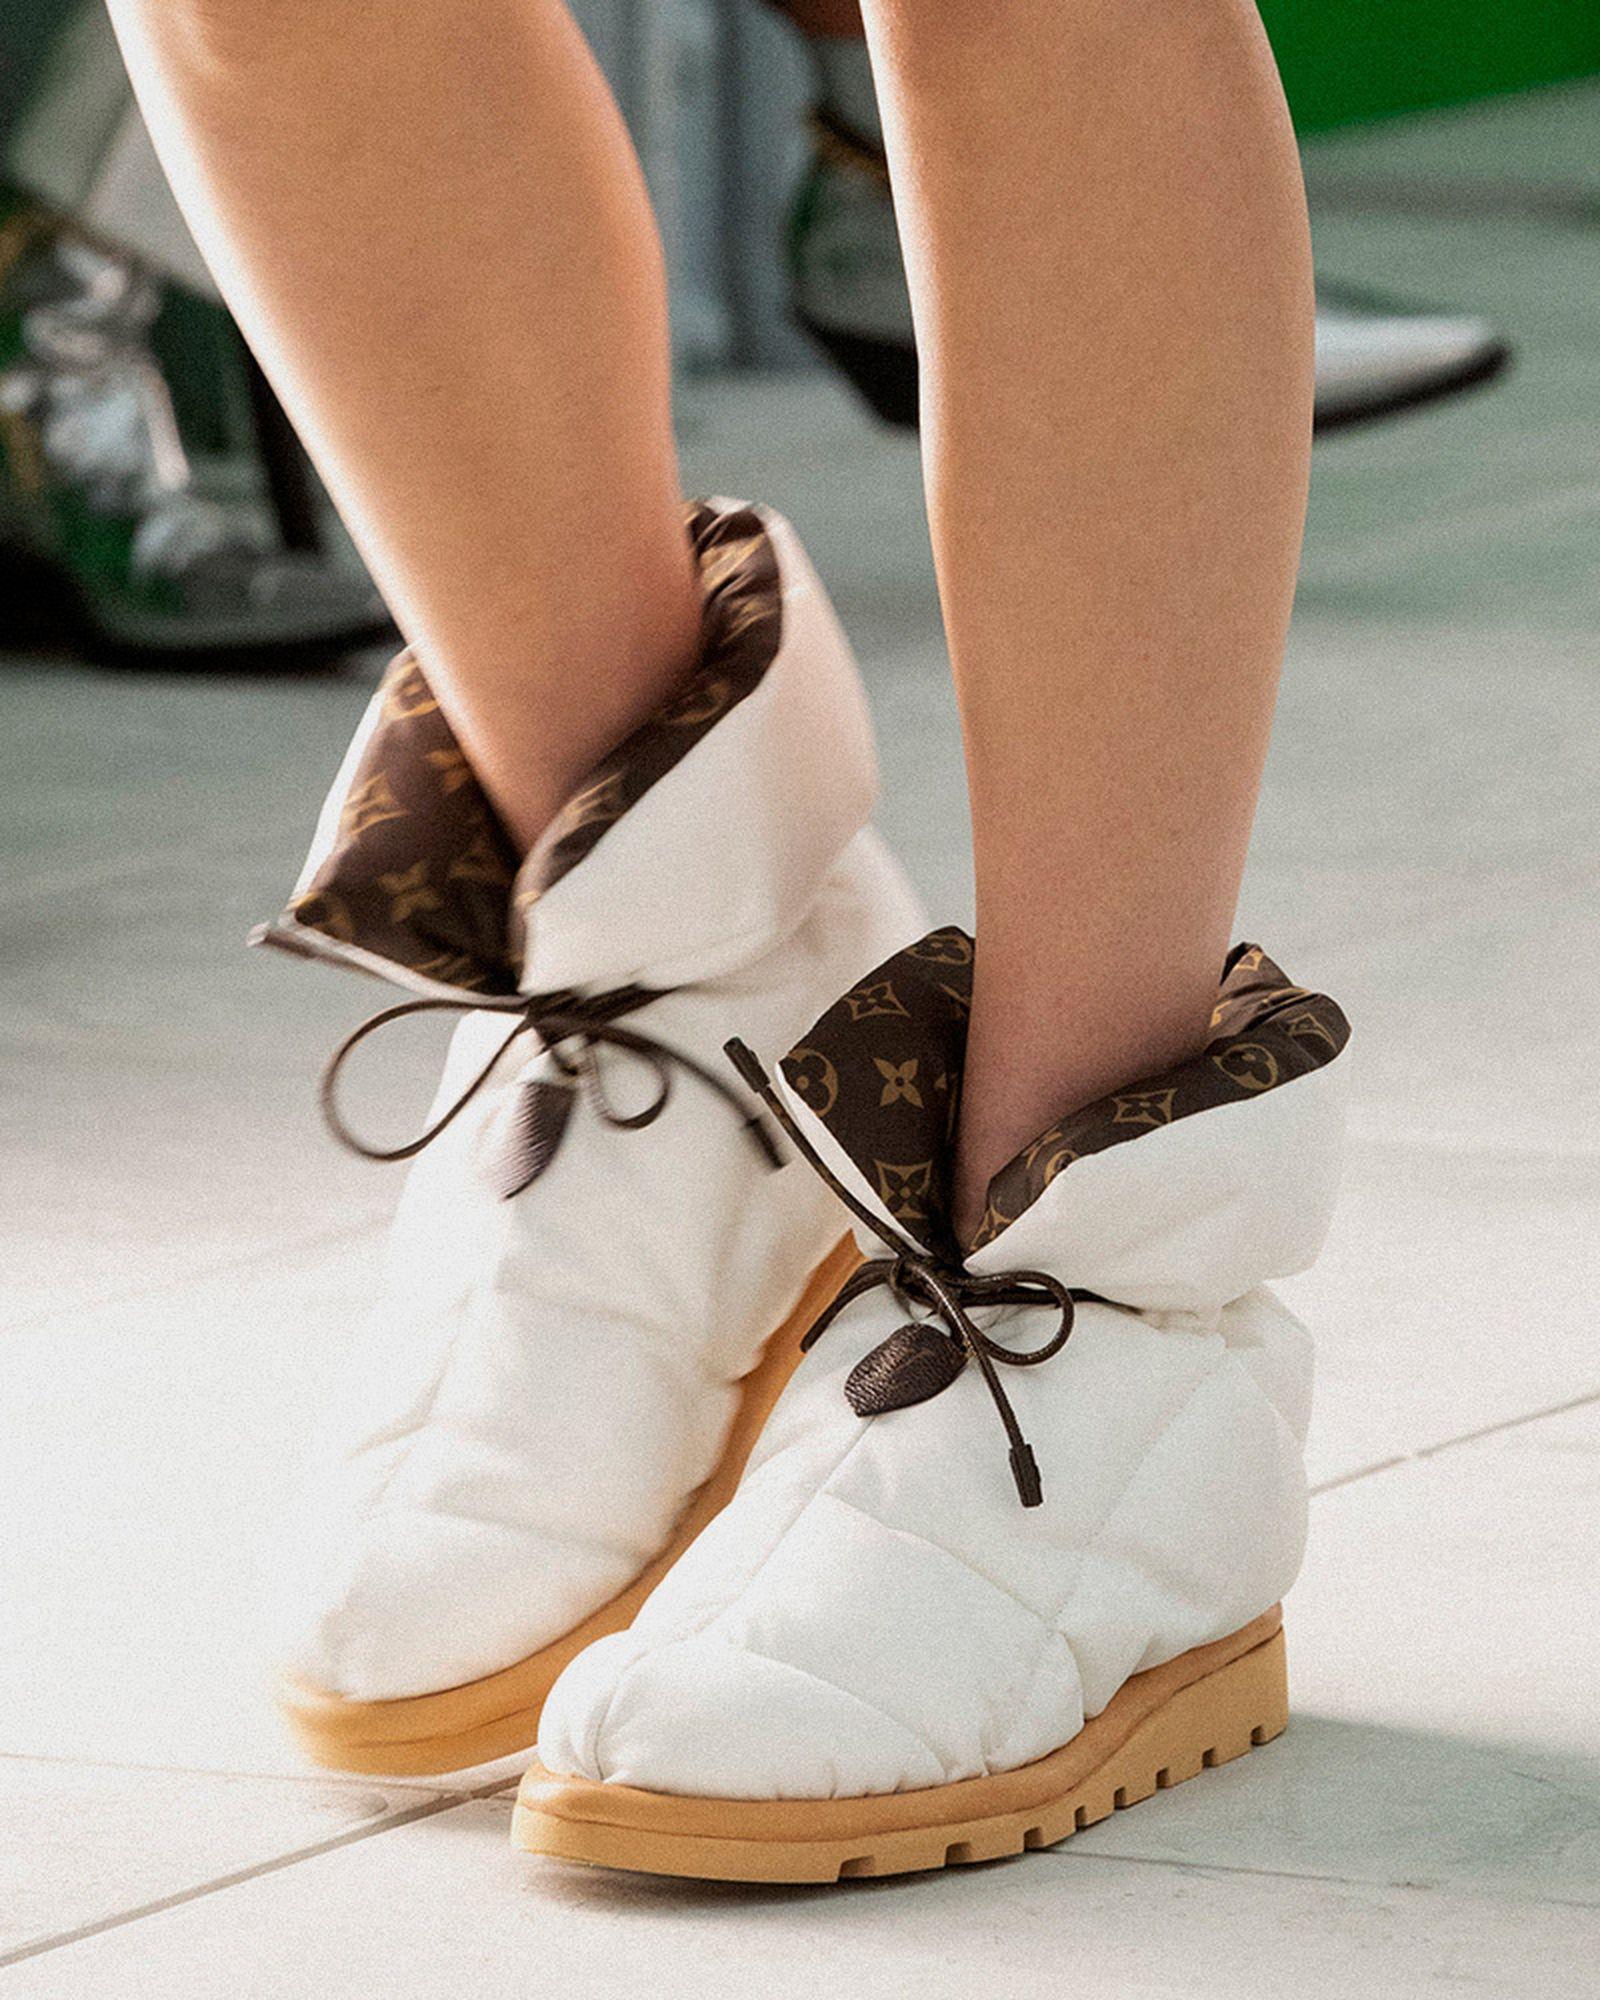 louis-vuitton-boots-spring-21-01